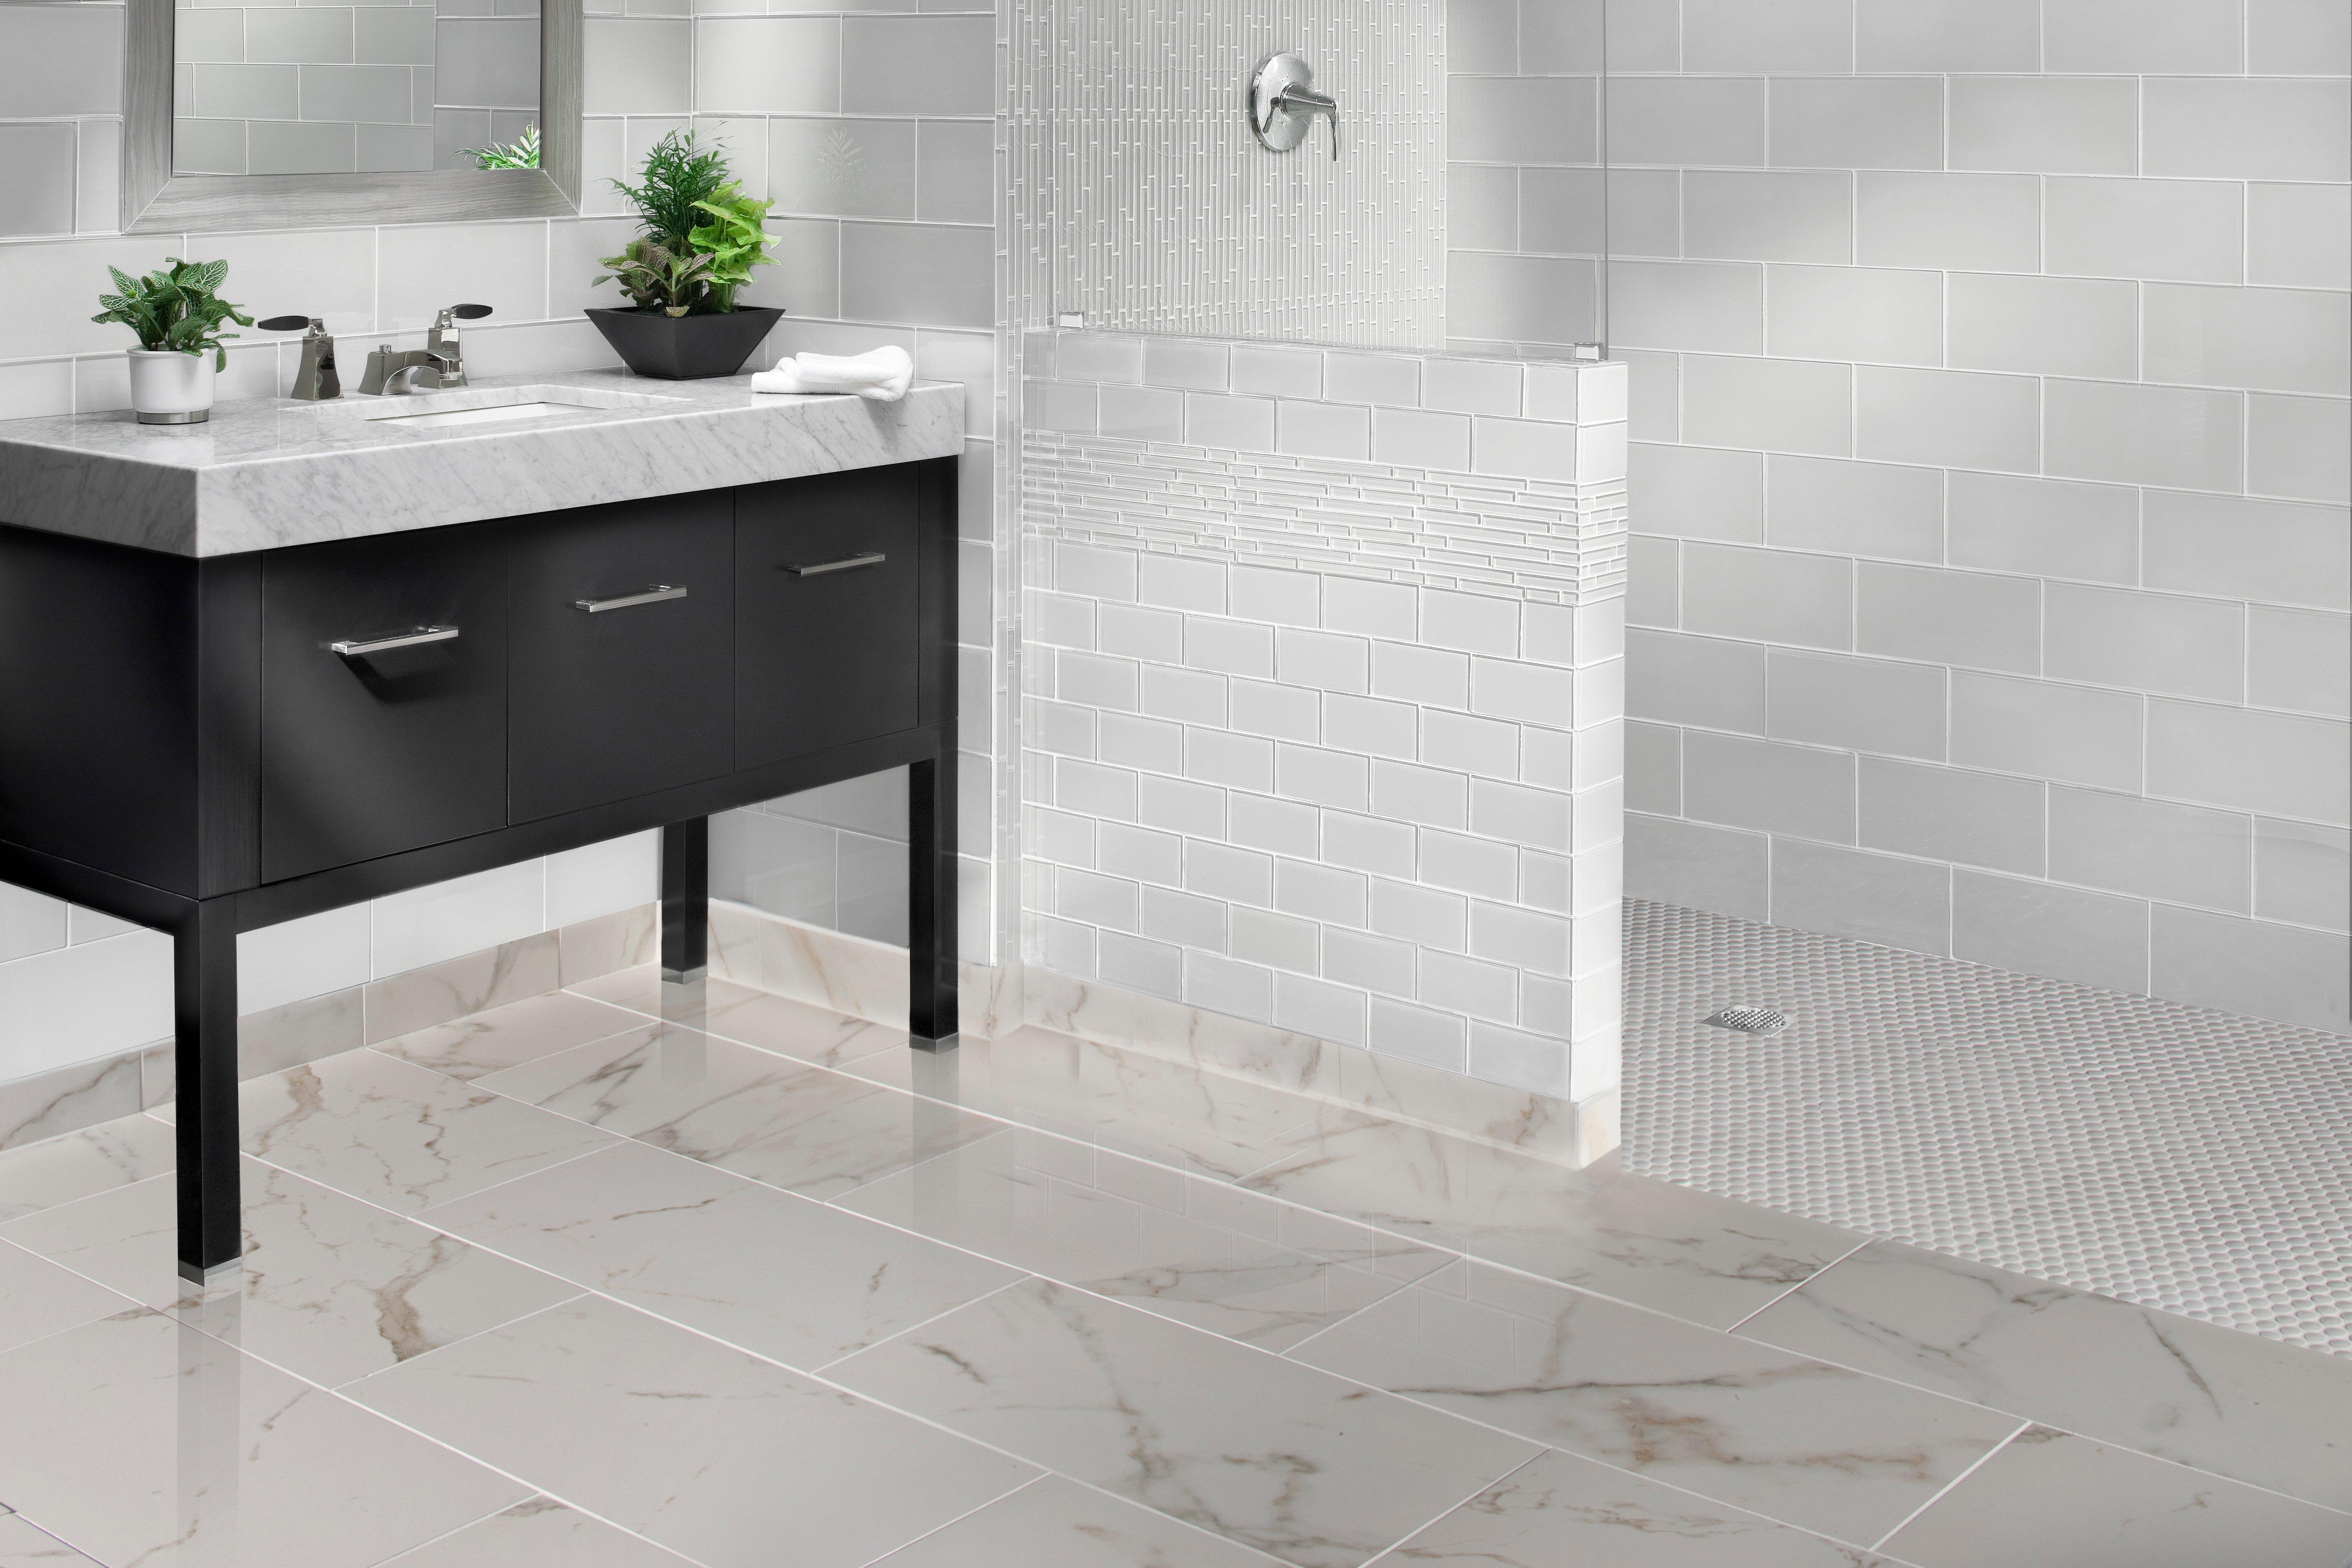 Modern Glass Floor Tiles Bathroom Frieze - Bathroom Design Ideas ...